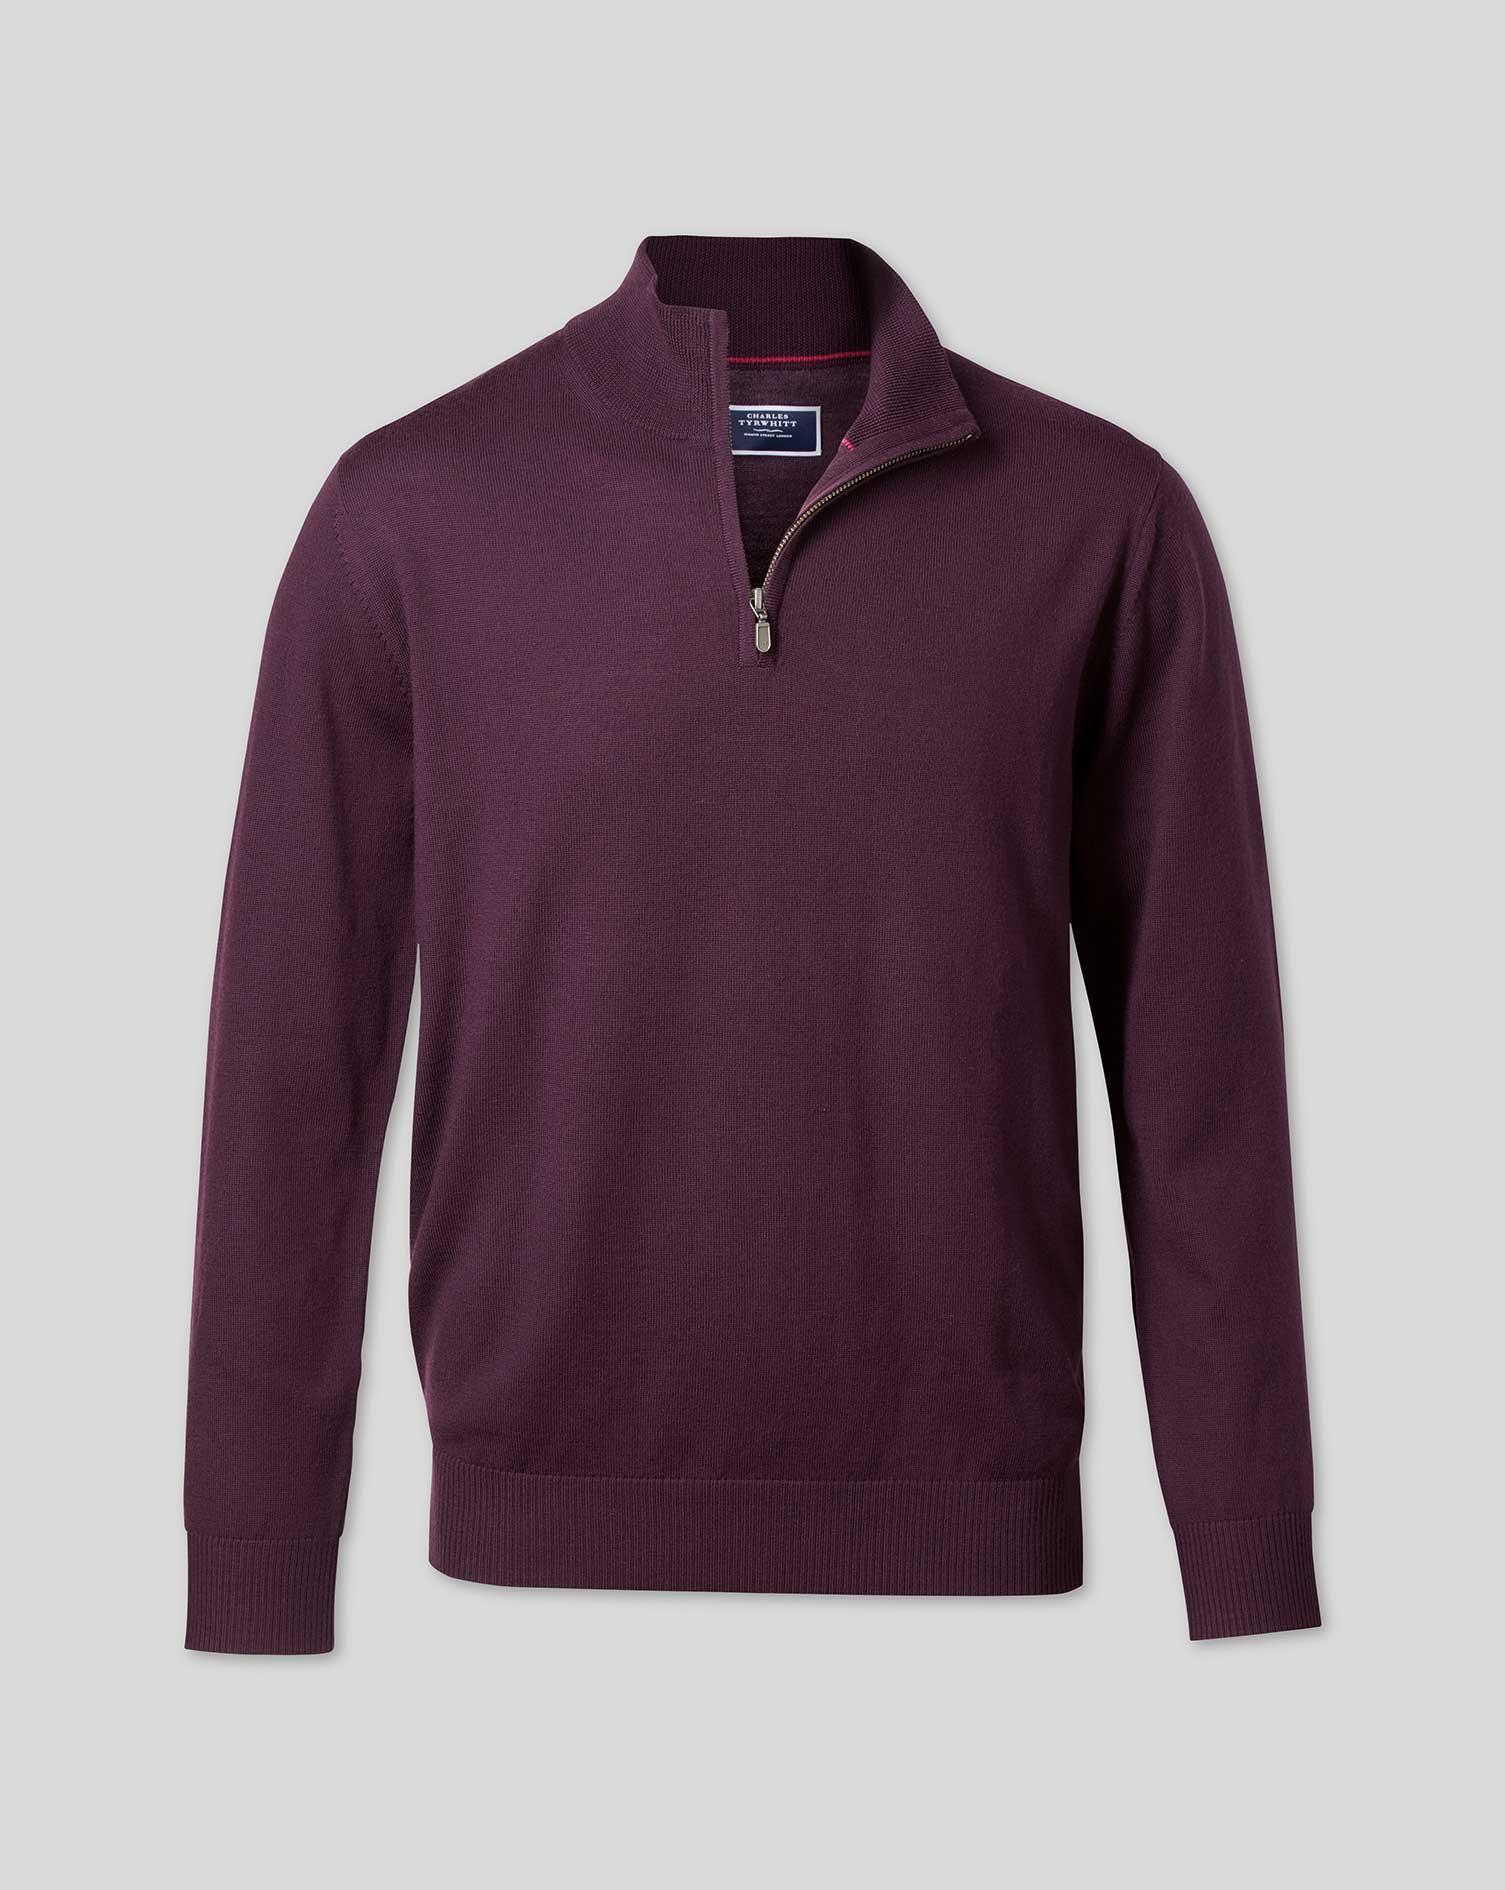 Wine Zip Neck Merino Wool Jumper Size XXXL by Charles Tyrwhitt